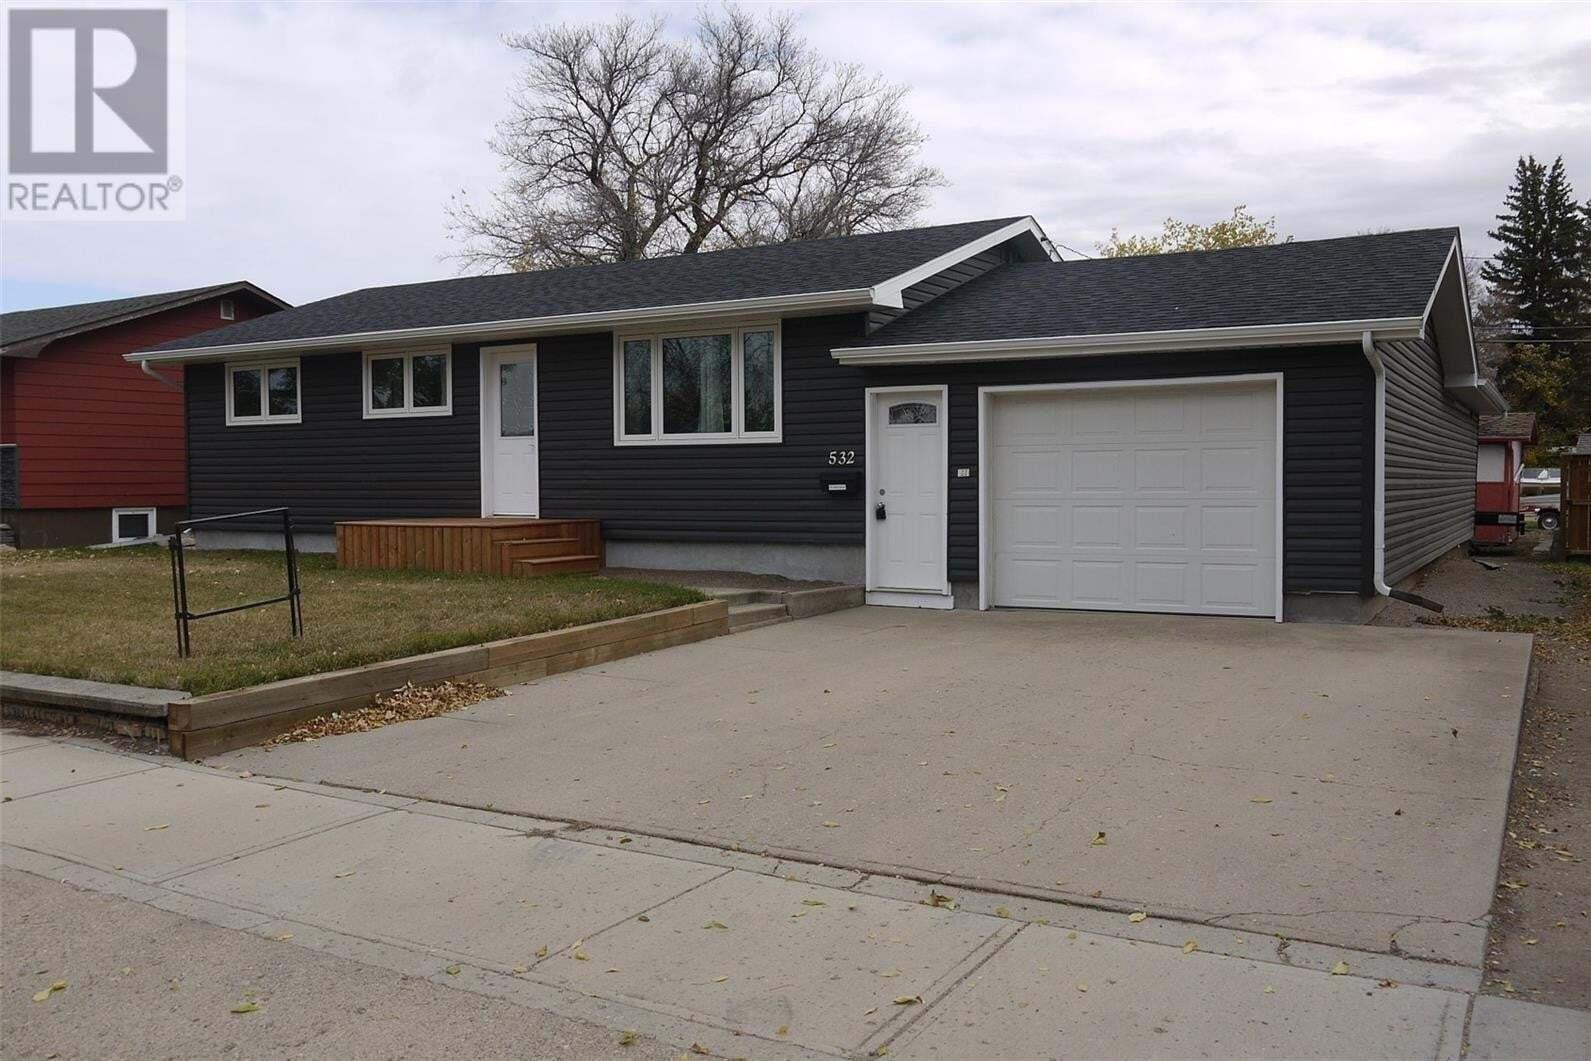 House for sale at 532 Elizabeth St Weyburn Saskatchewan - MLS: SK824308